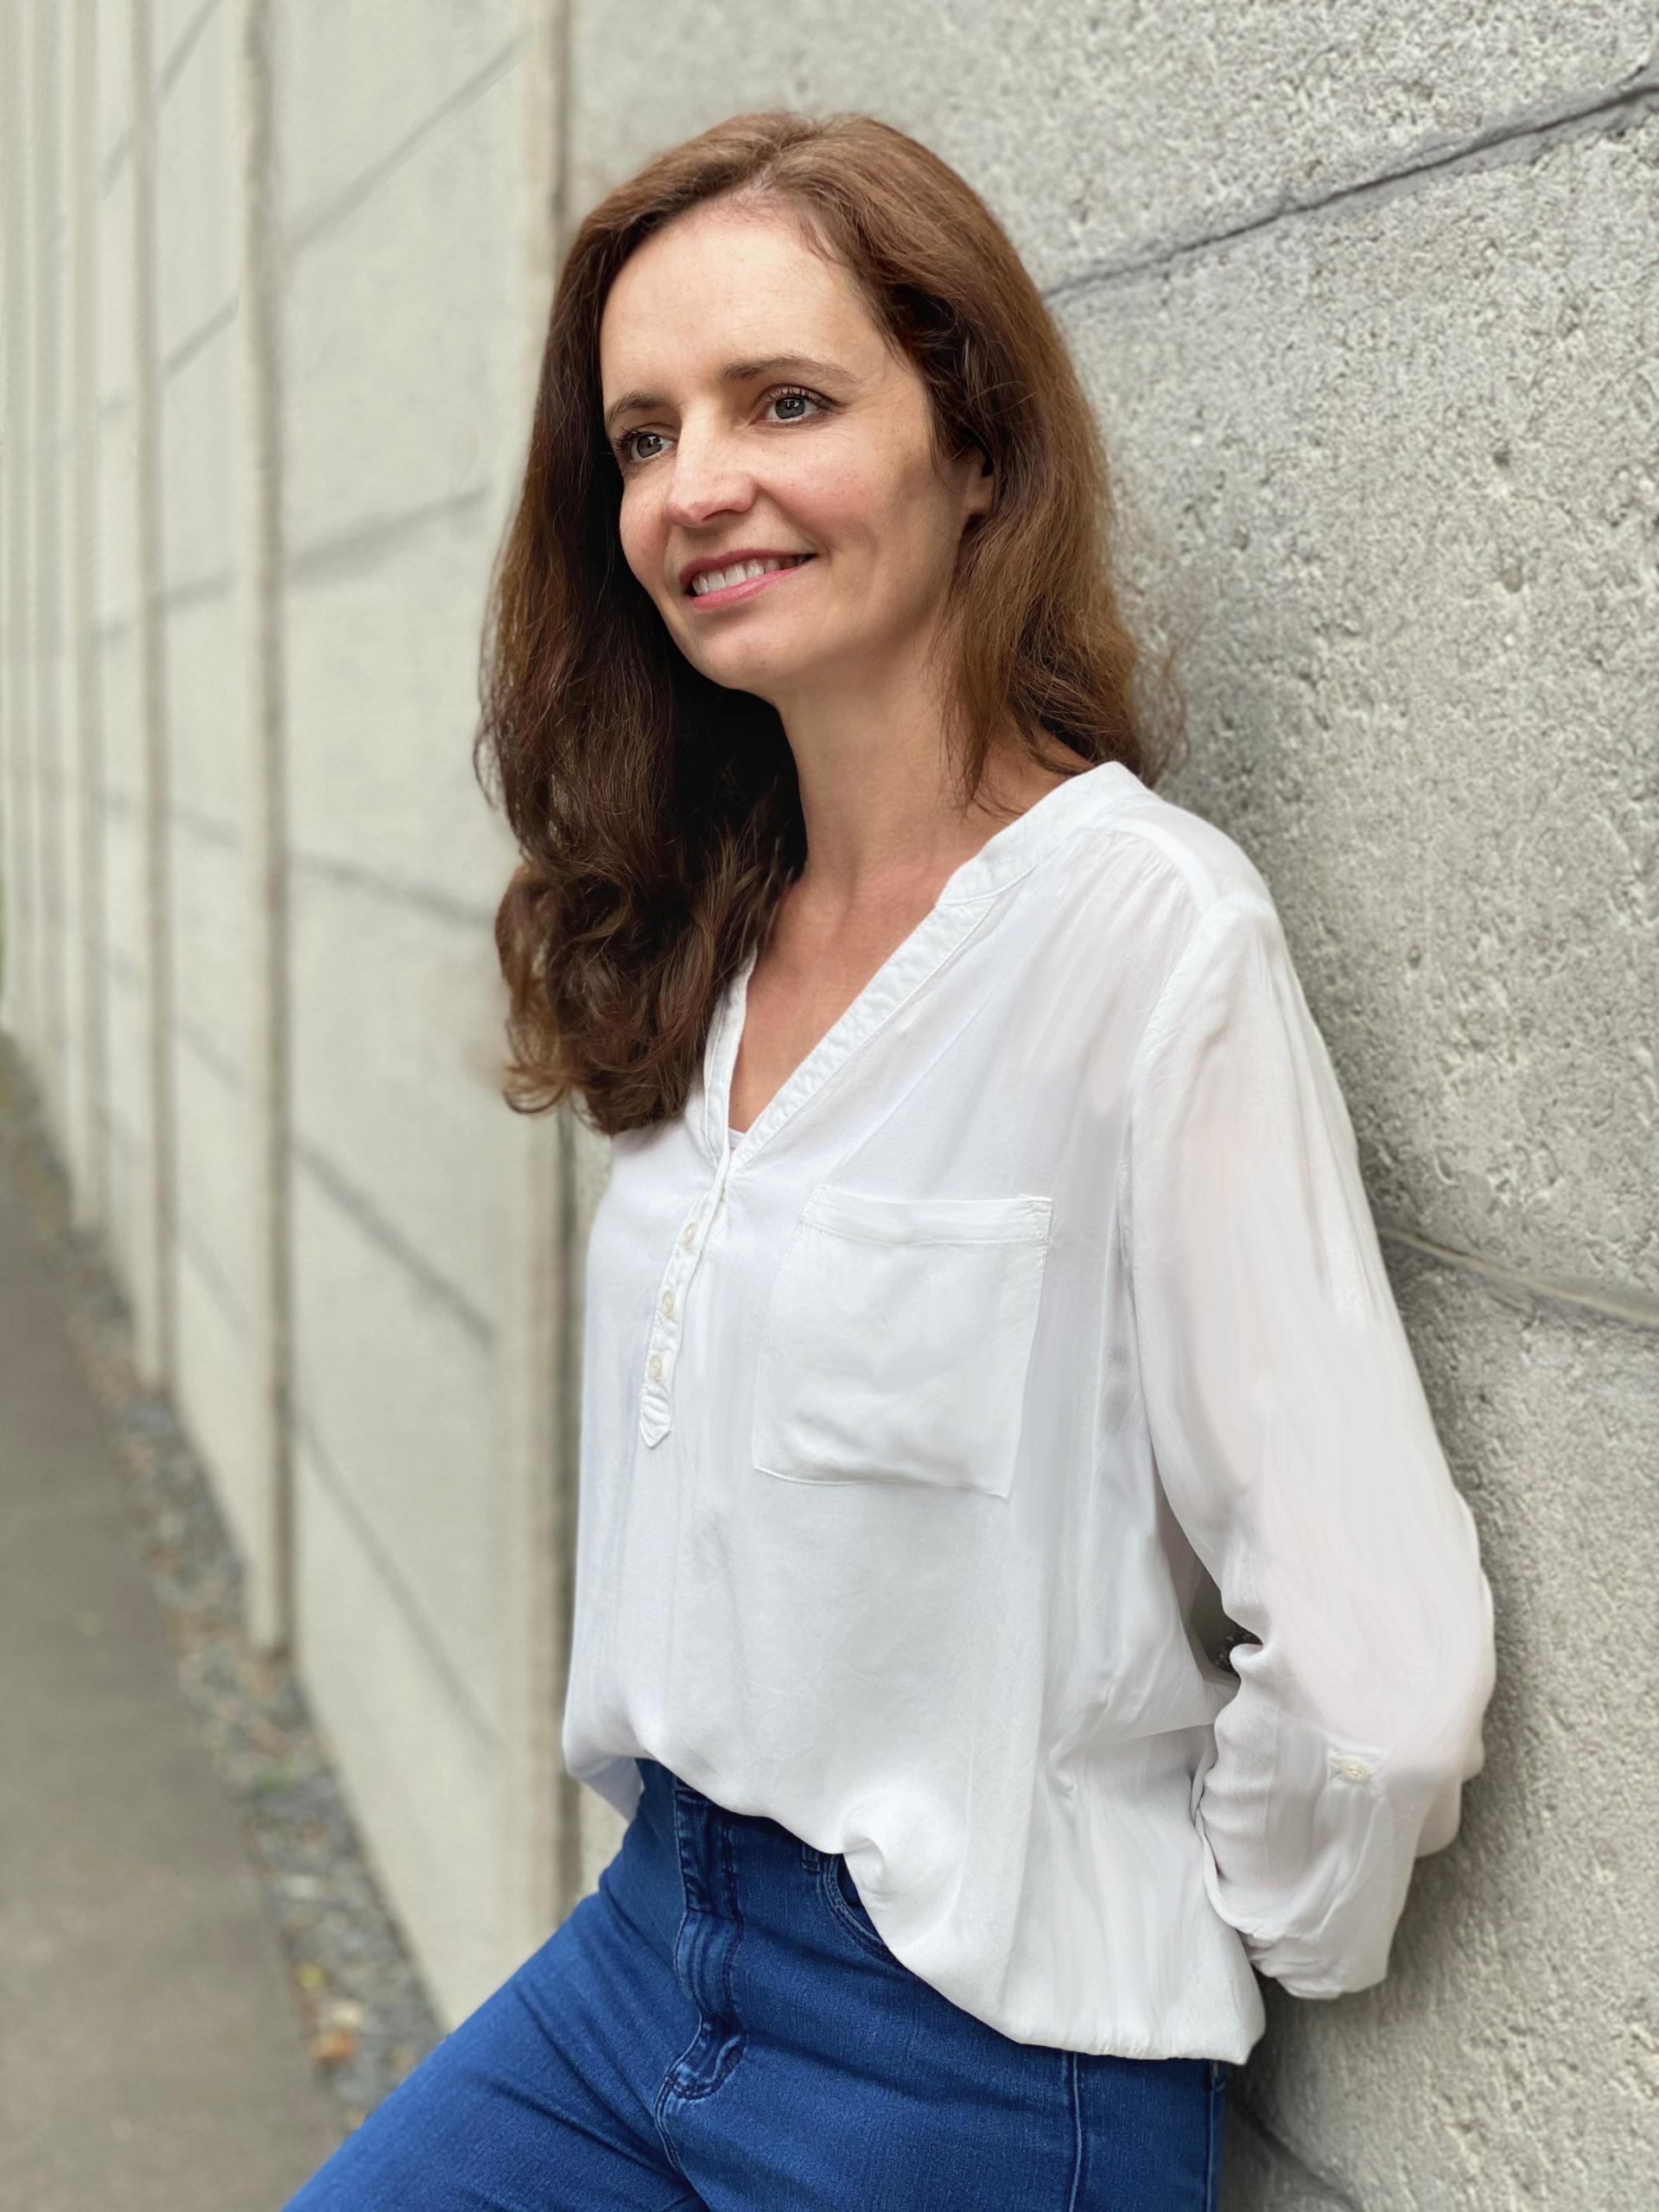 Virtuelle Assistentin Tatjana Kiefler Podcast Service Unterstützung Schnitt Klang Upload Assistenz